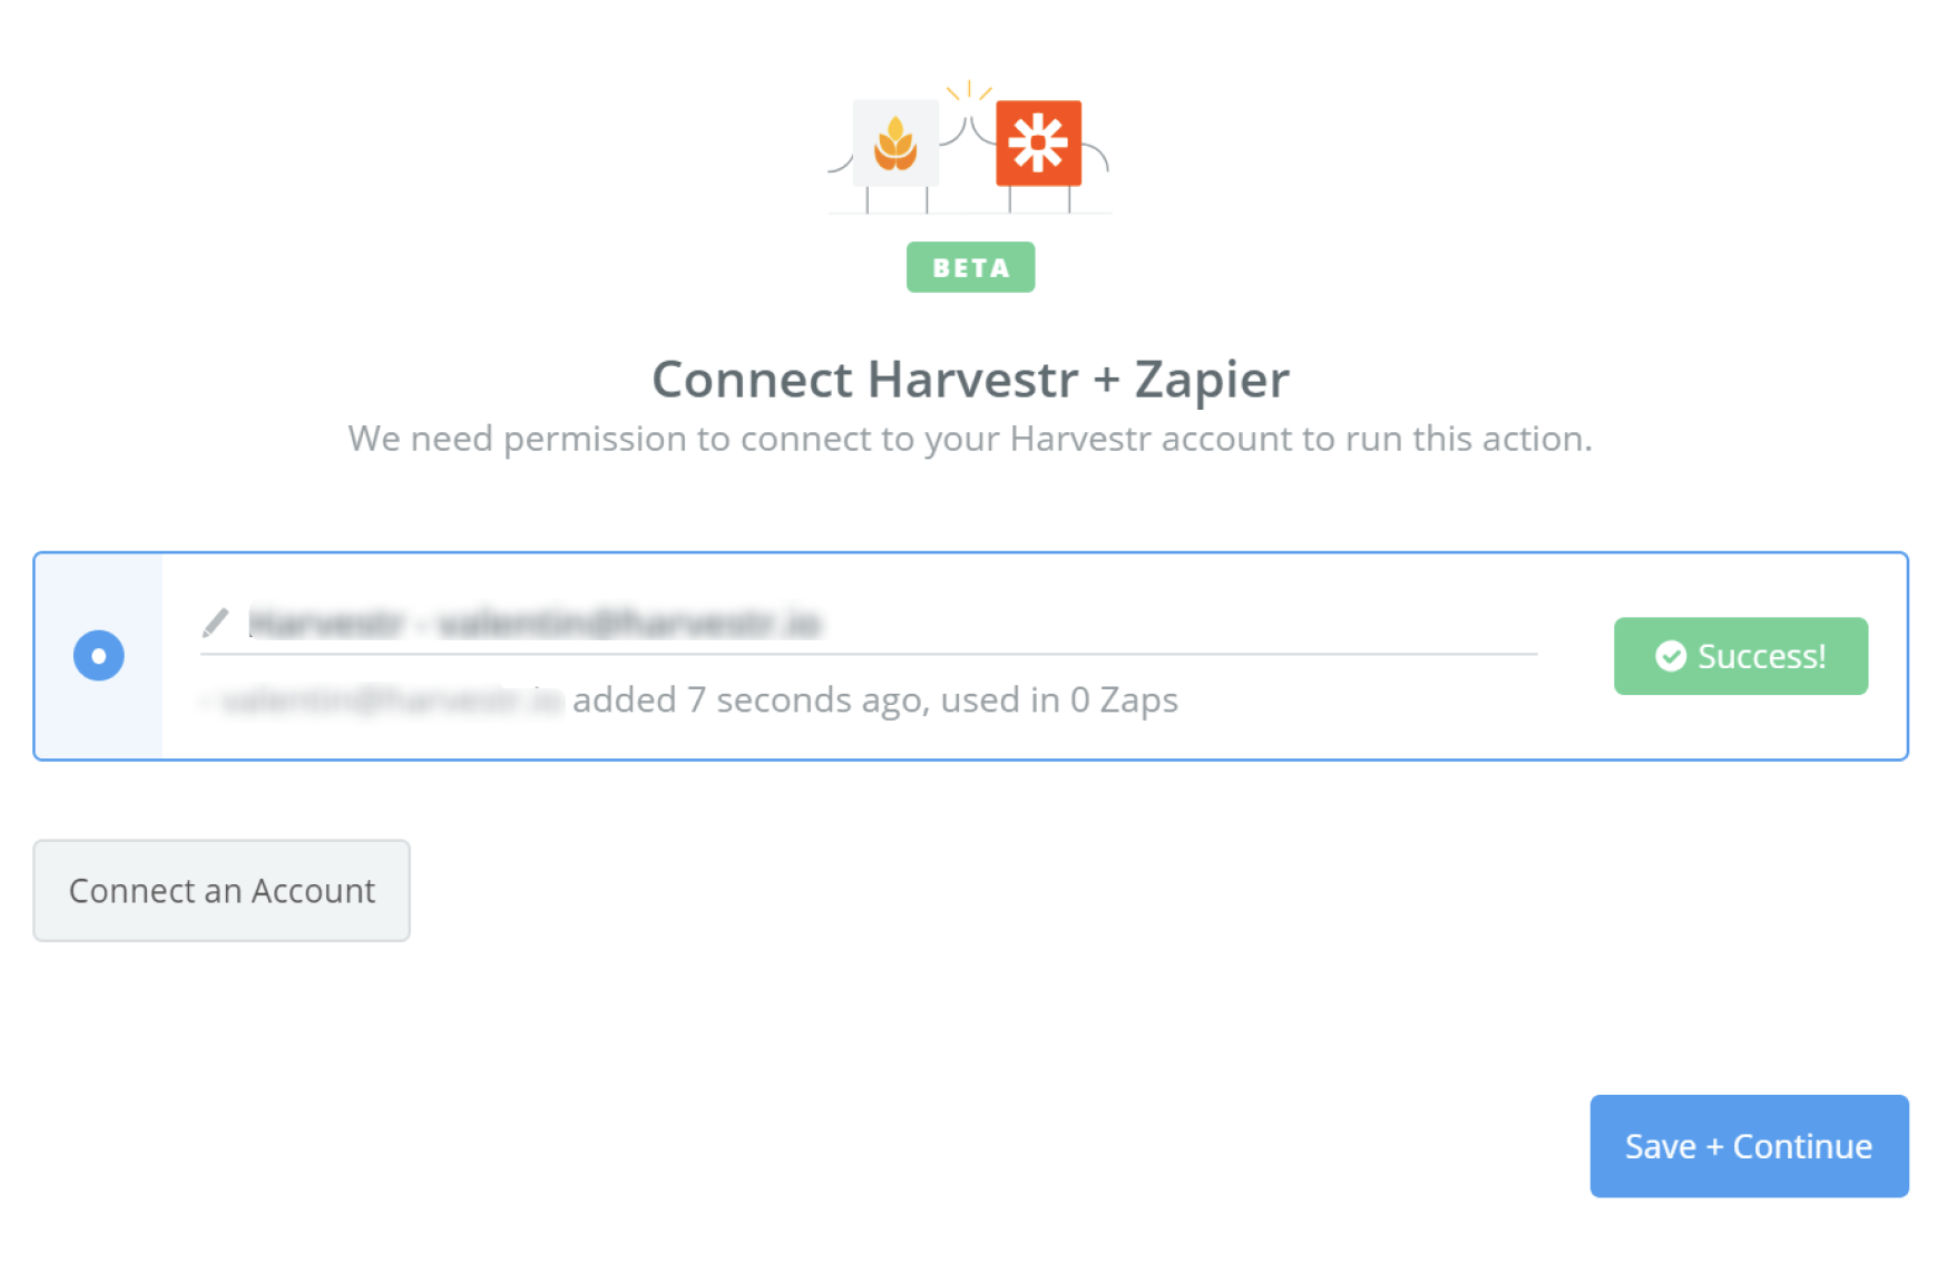 Harvestr connection successfull